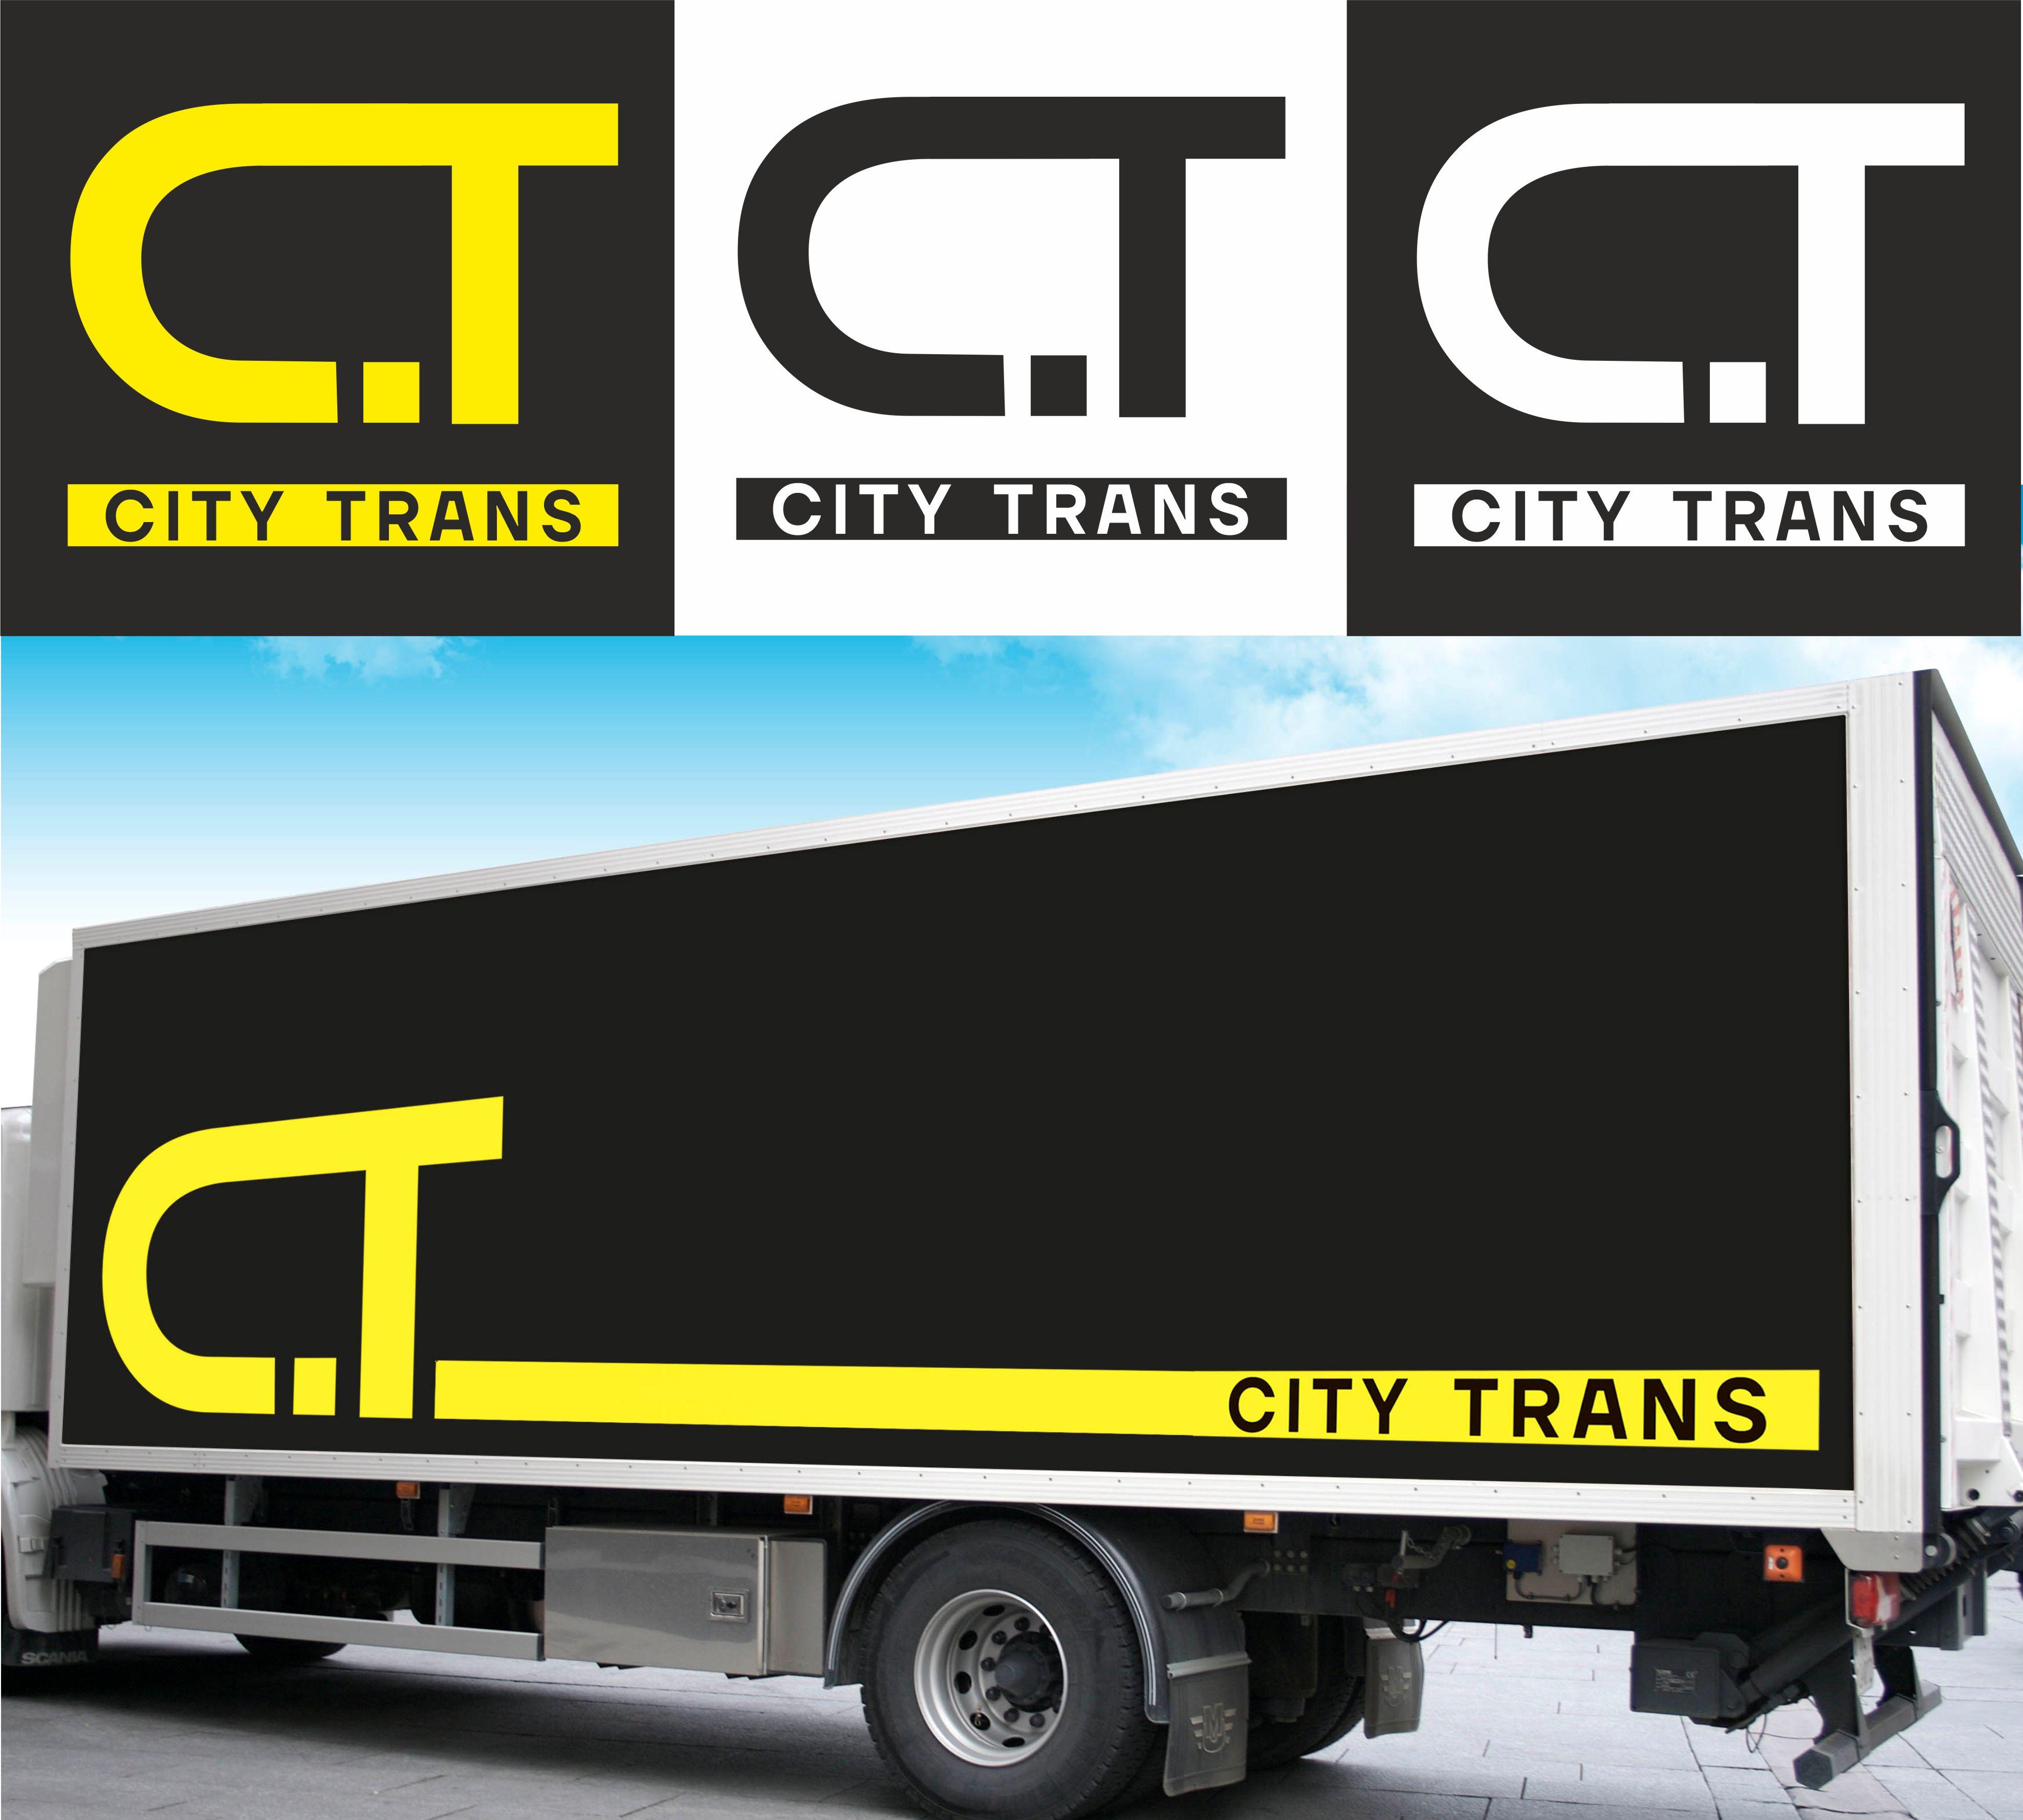 Разработка Логотипа транспортной компании фото f_4655e74d6f25c5d9.jpg